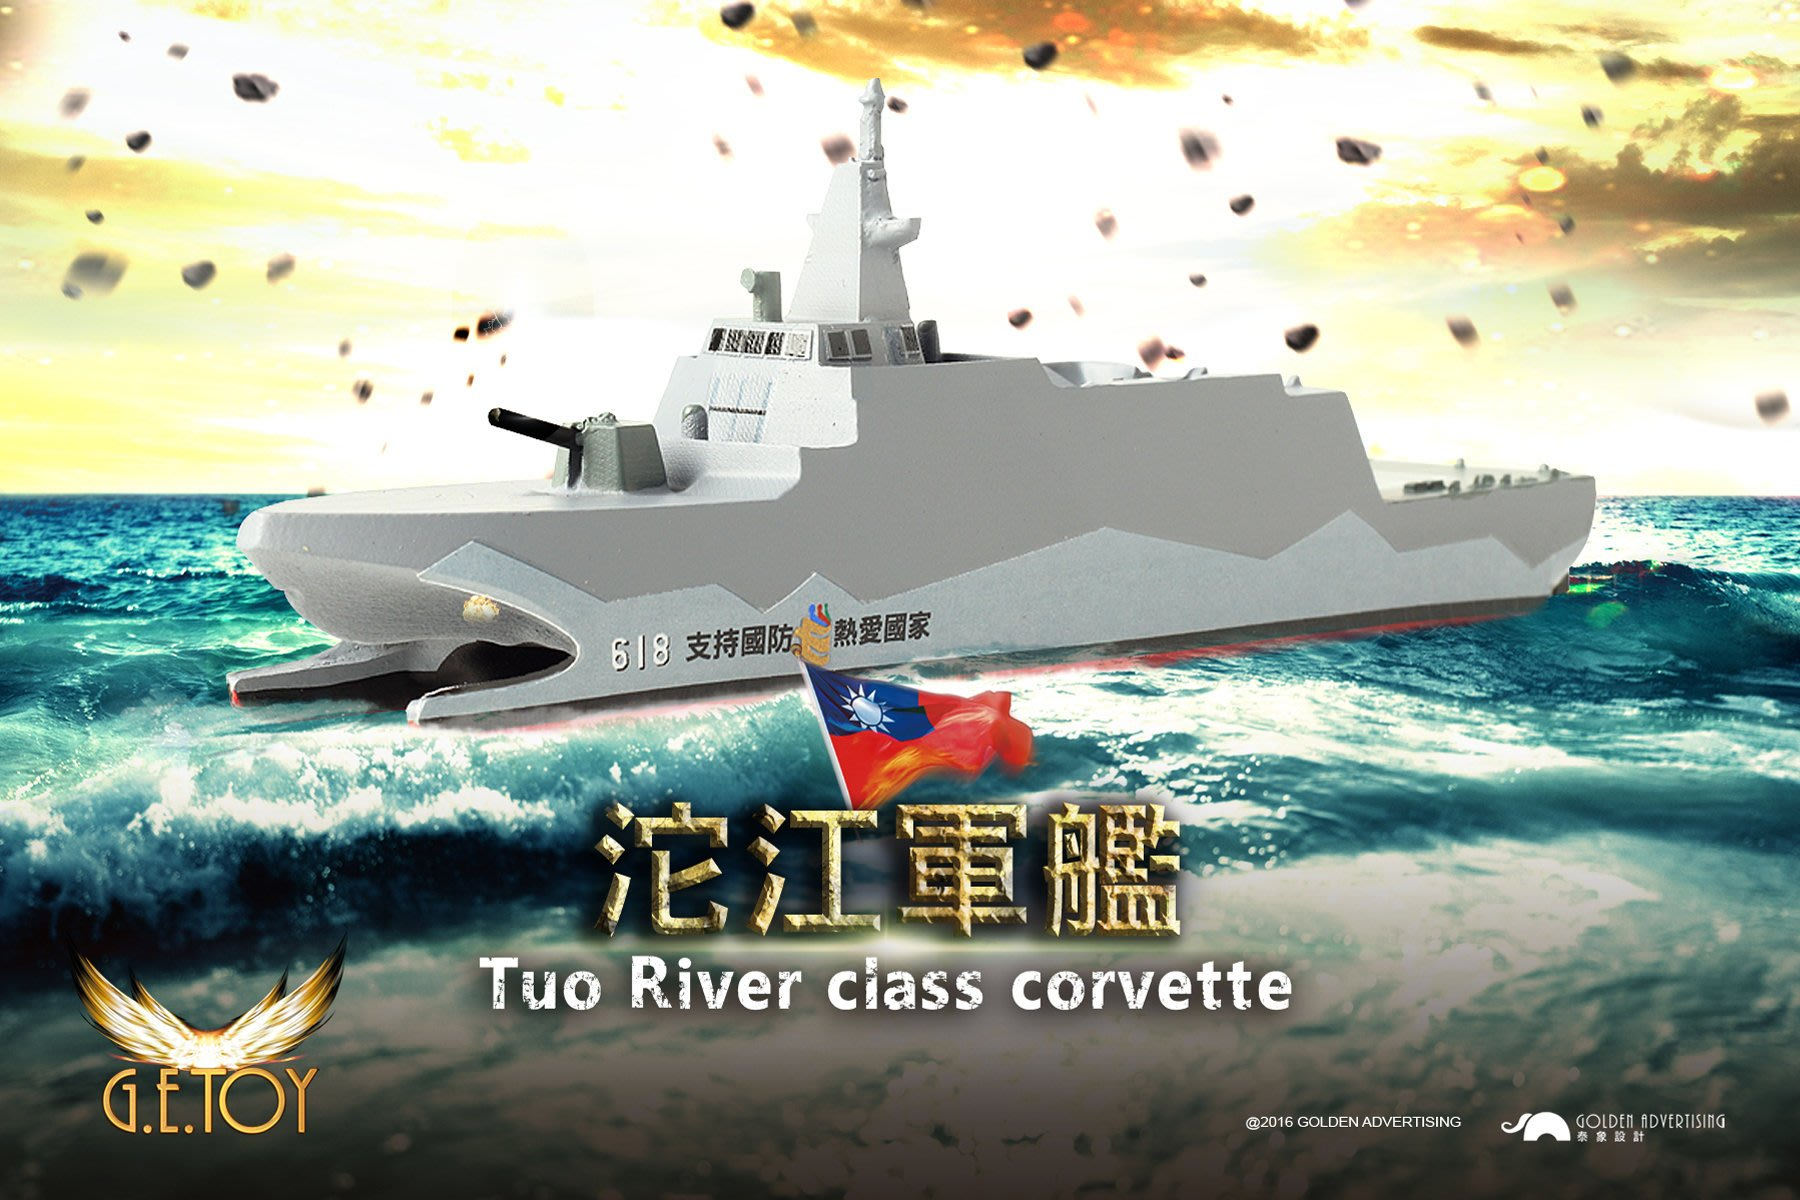 【GEToy】「沱江軍艦(Tuo River class corvette)」手機座